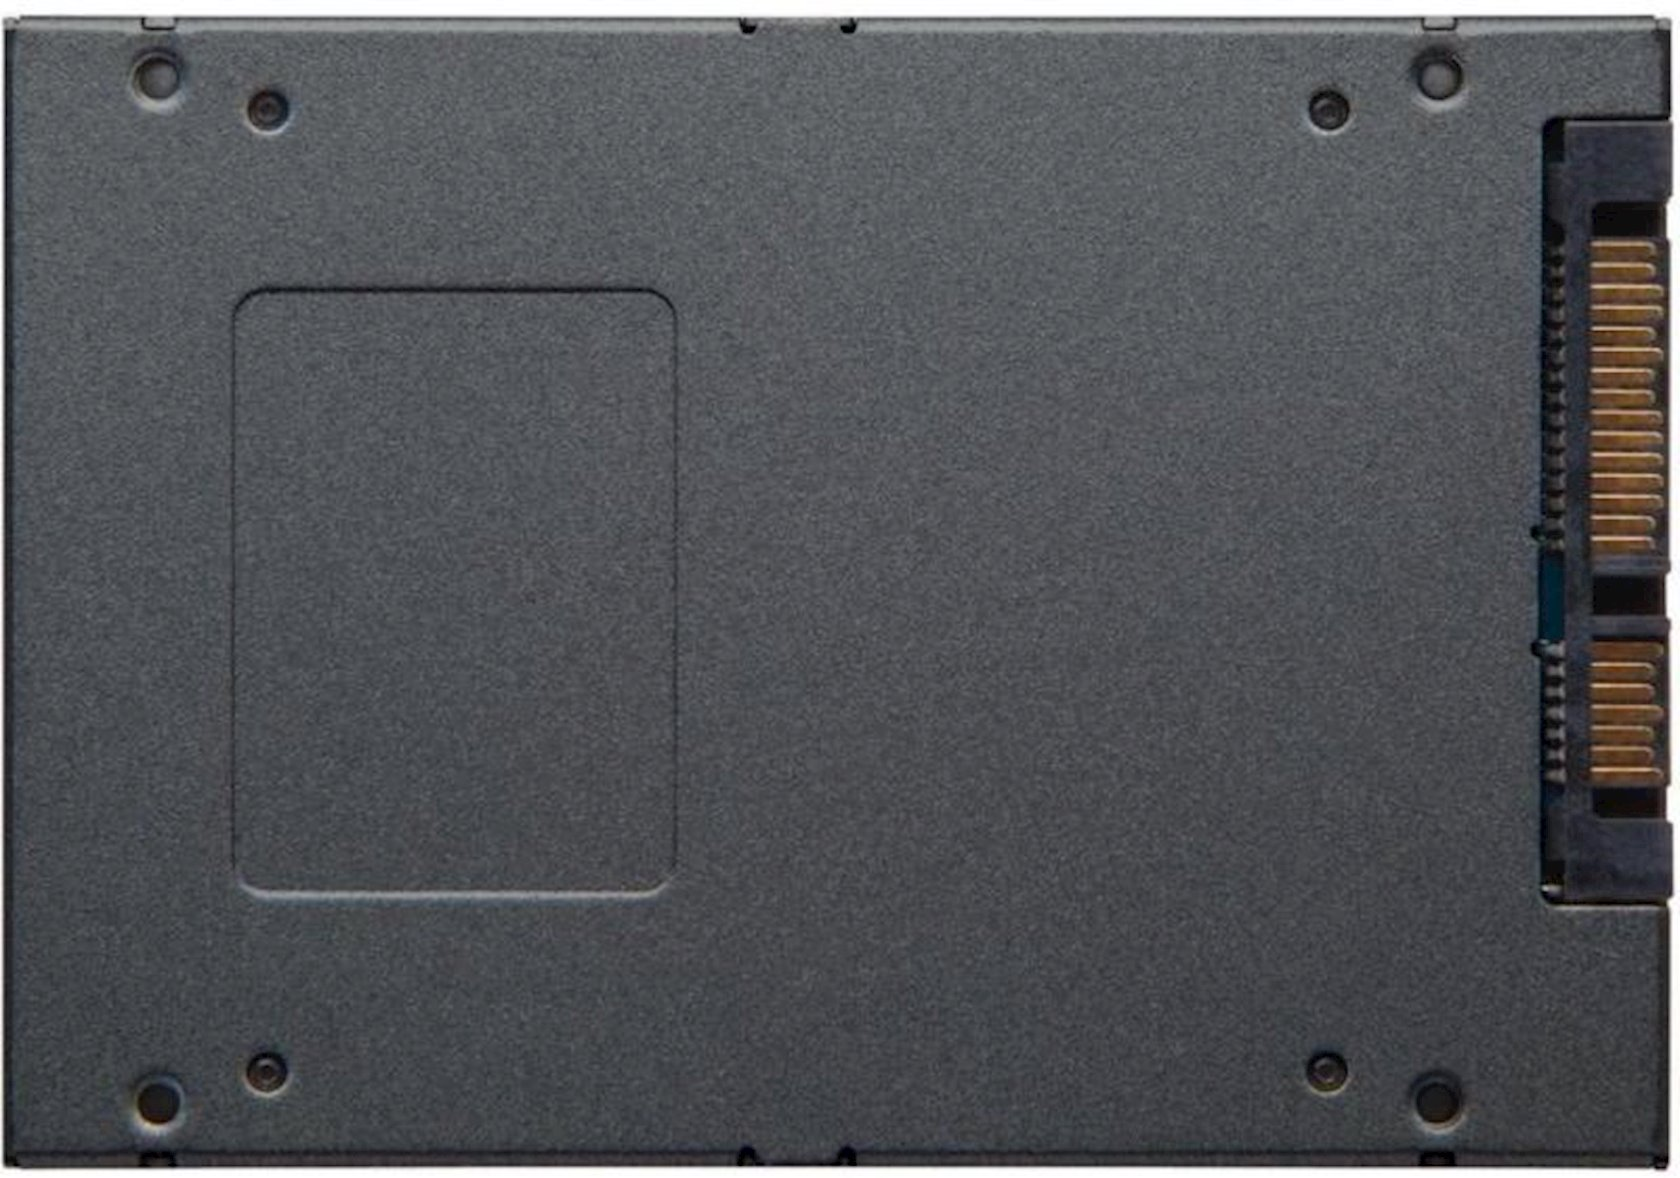 Disk SSD Kingston 120GB A400 SATA3 2.5 SSD (7mm height)